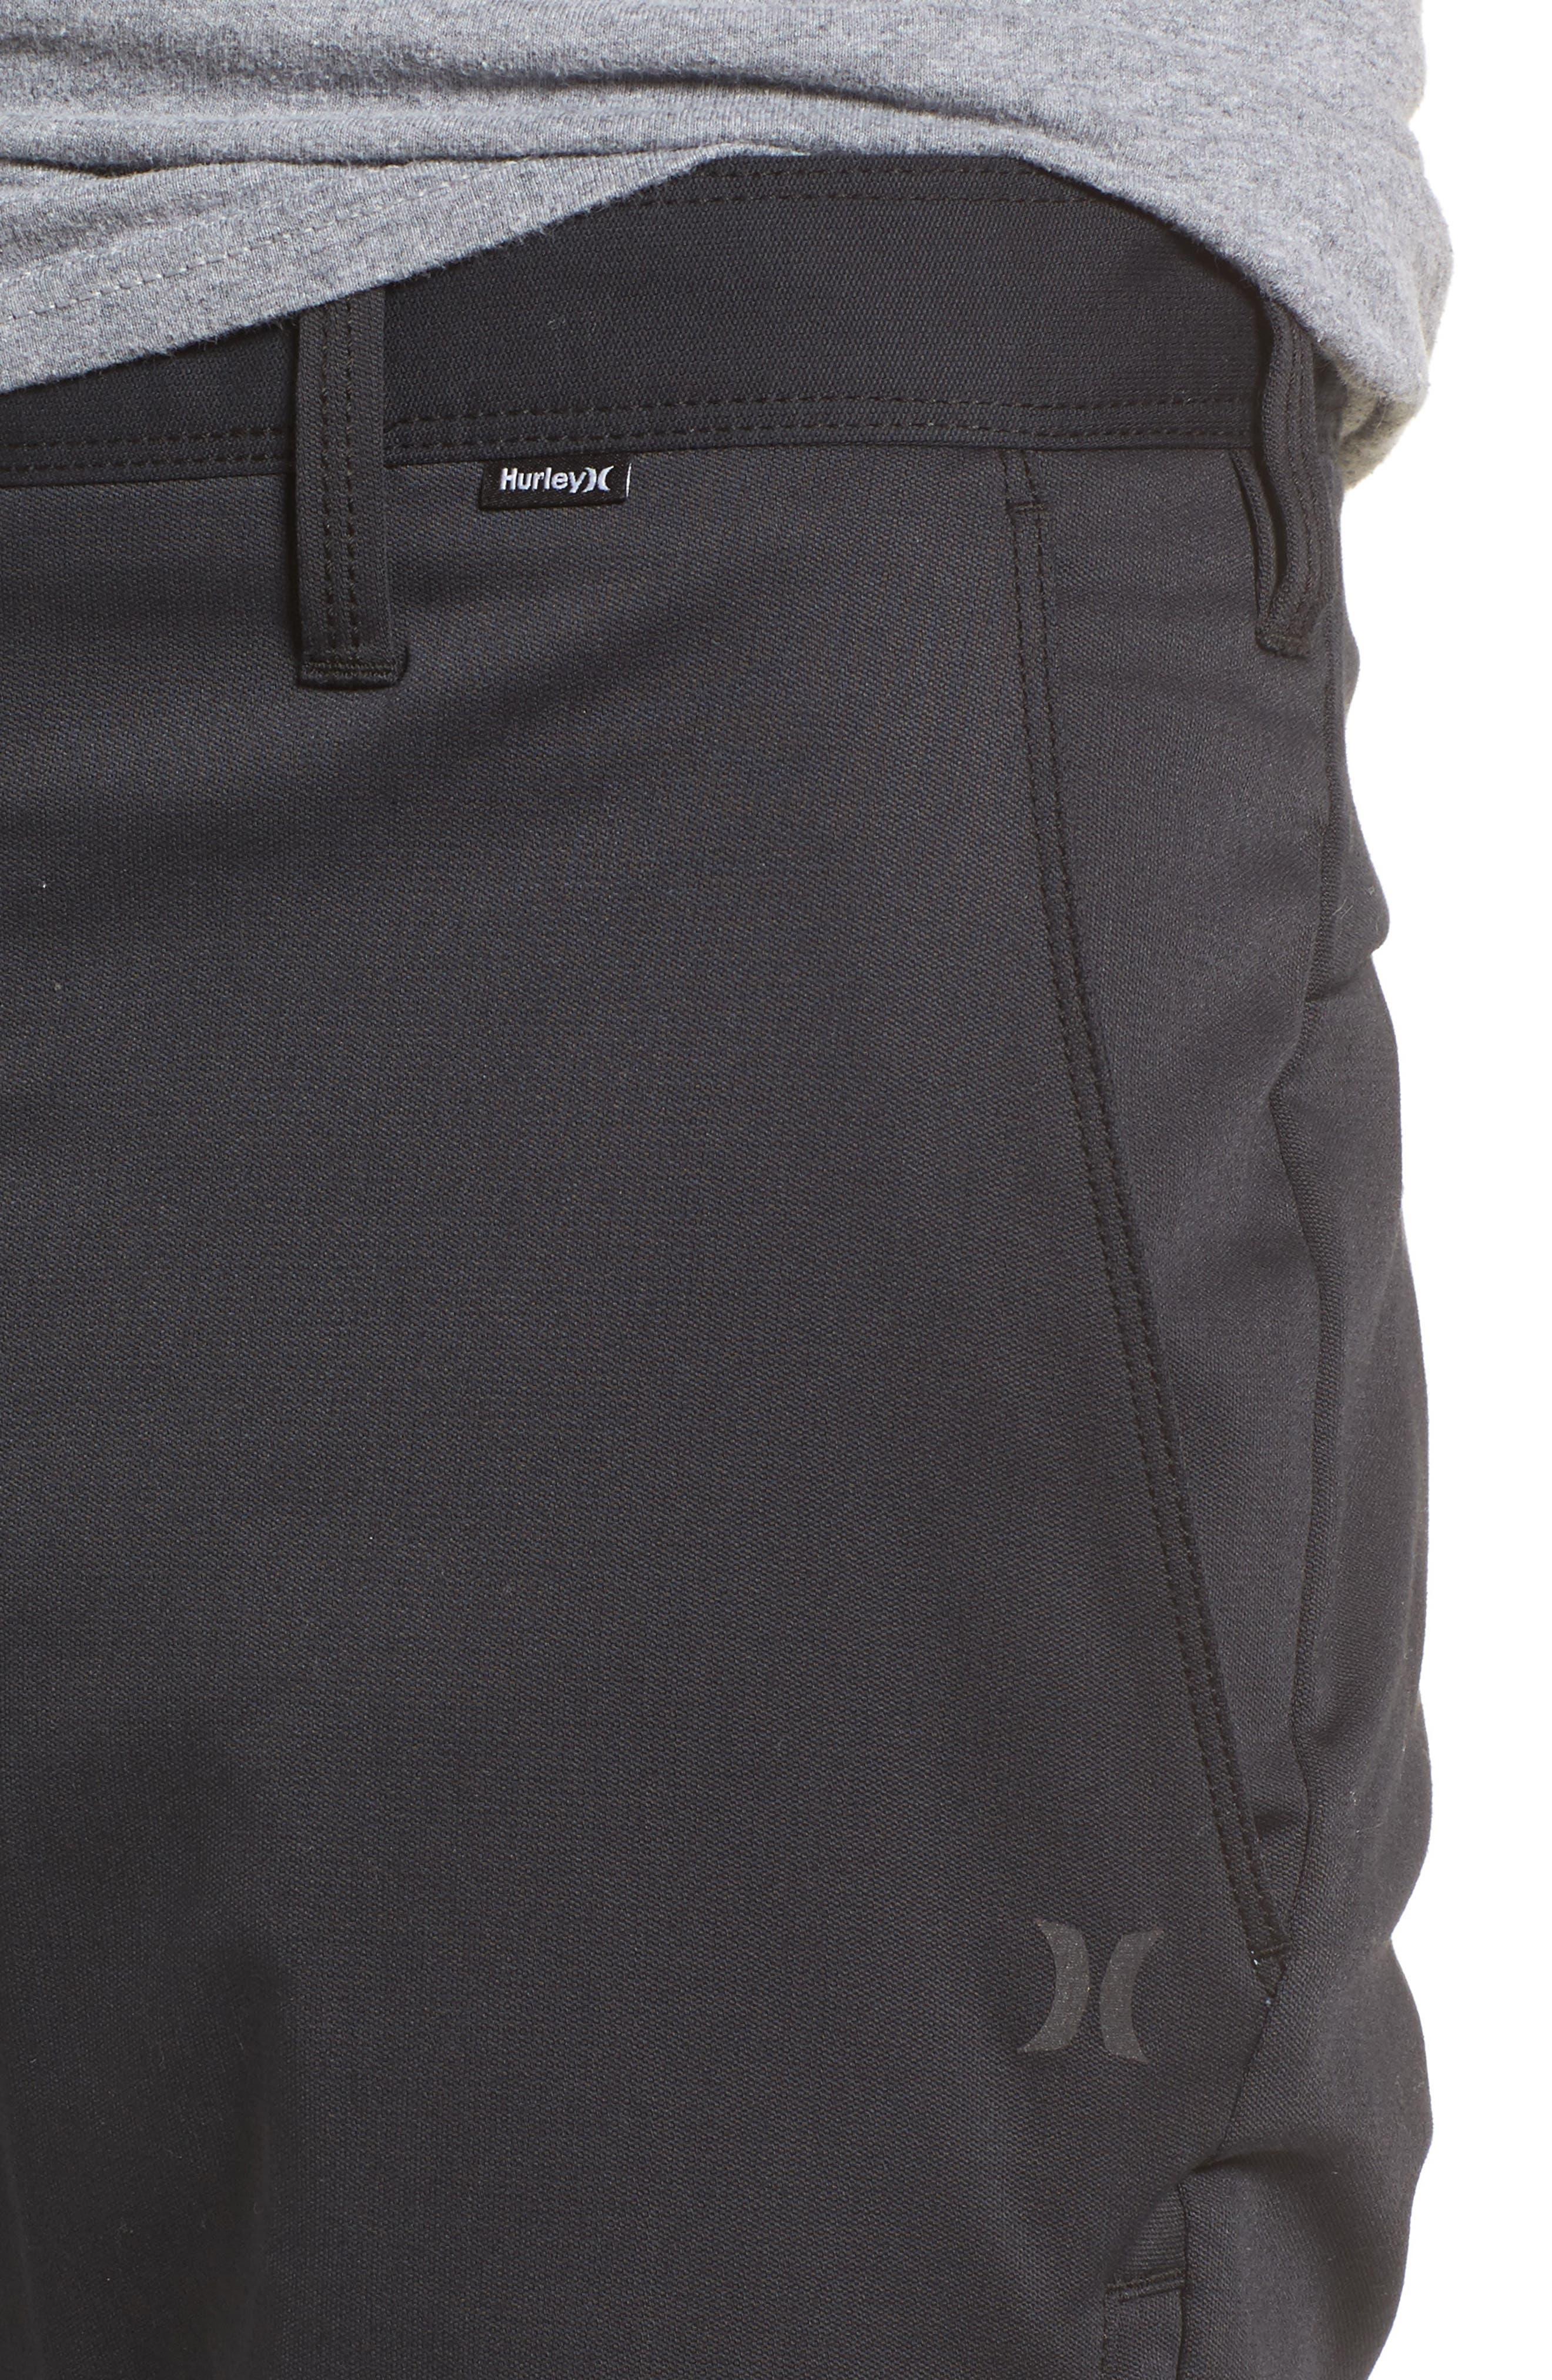 Covert Slim Fit Crop Pants,                             Alternate thumbnail 4, color,                             Black